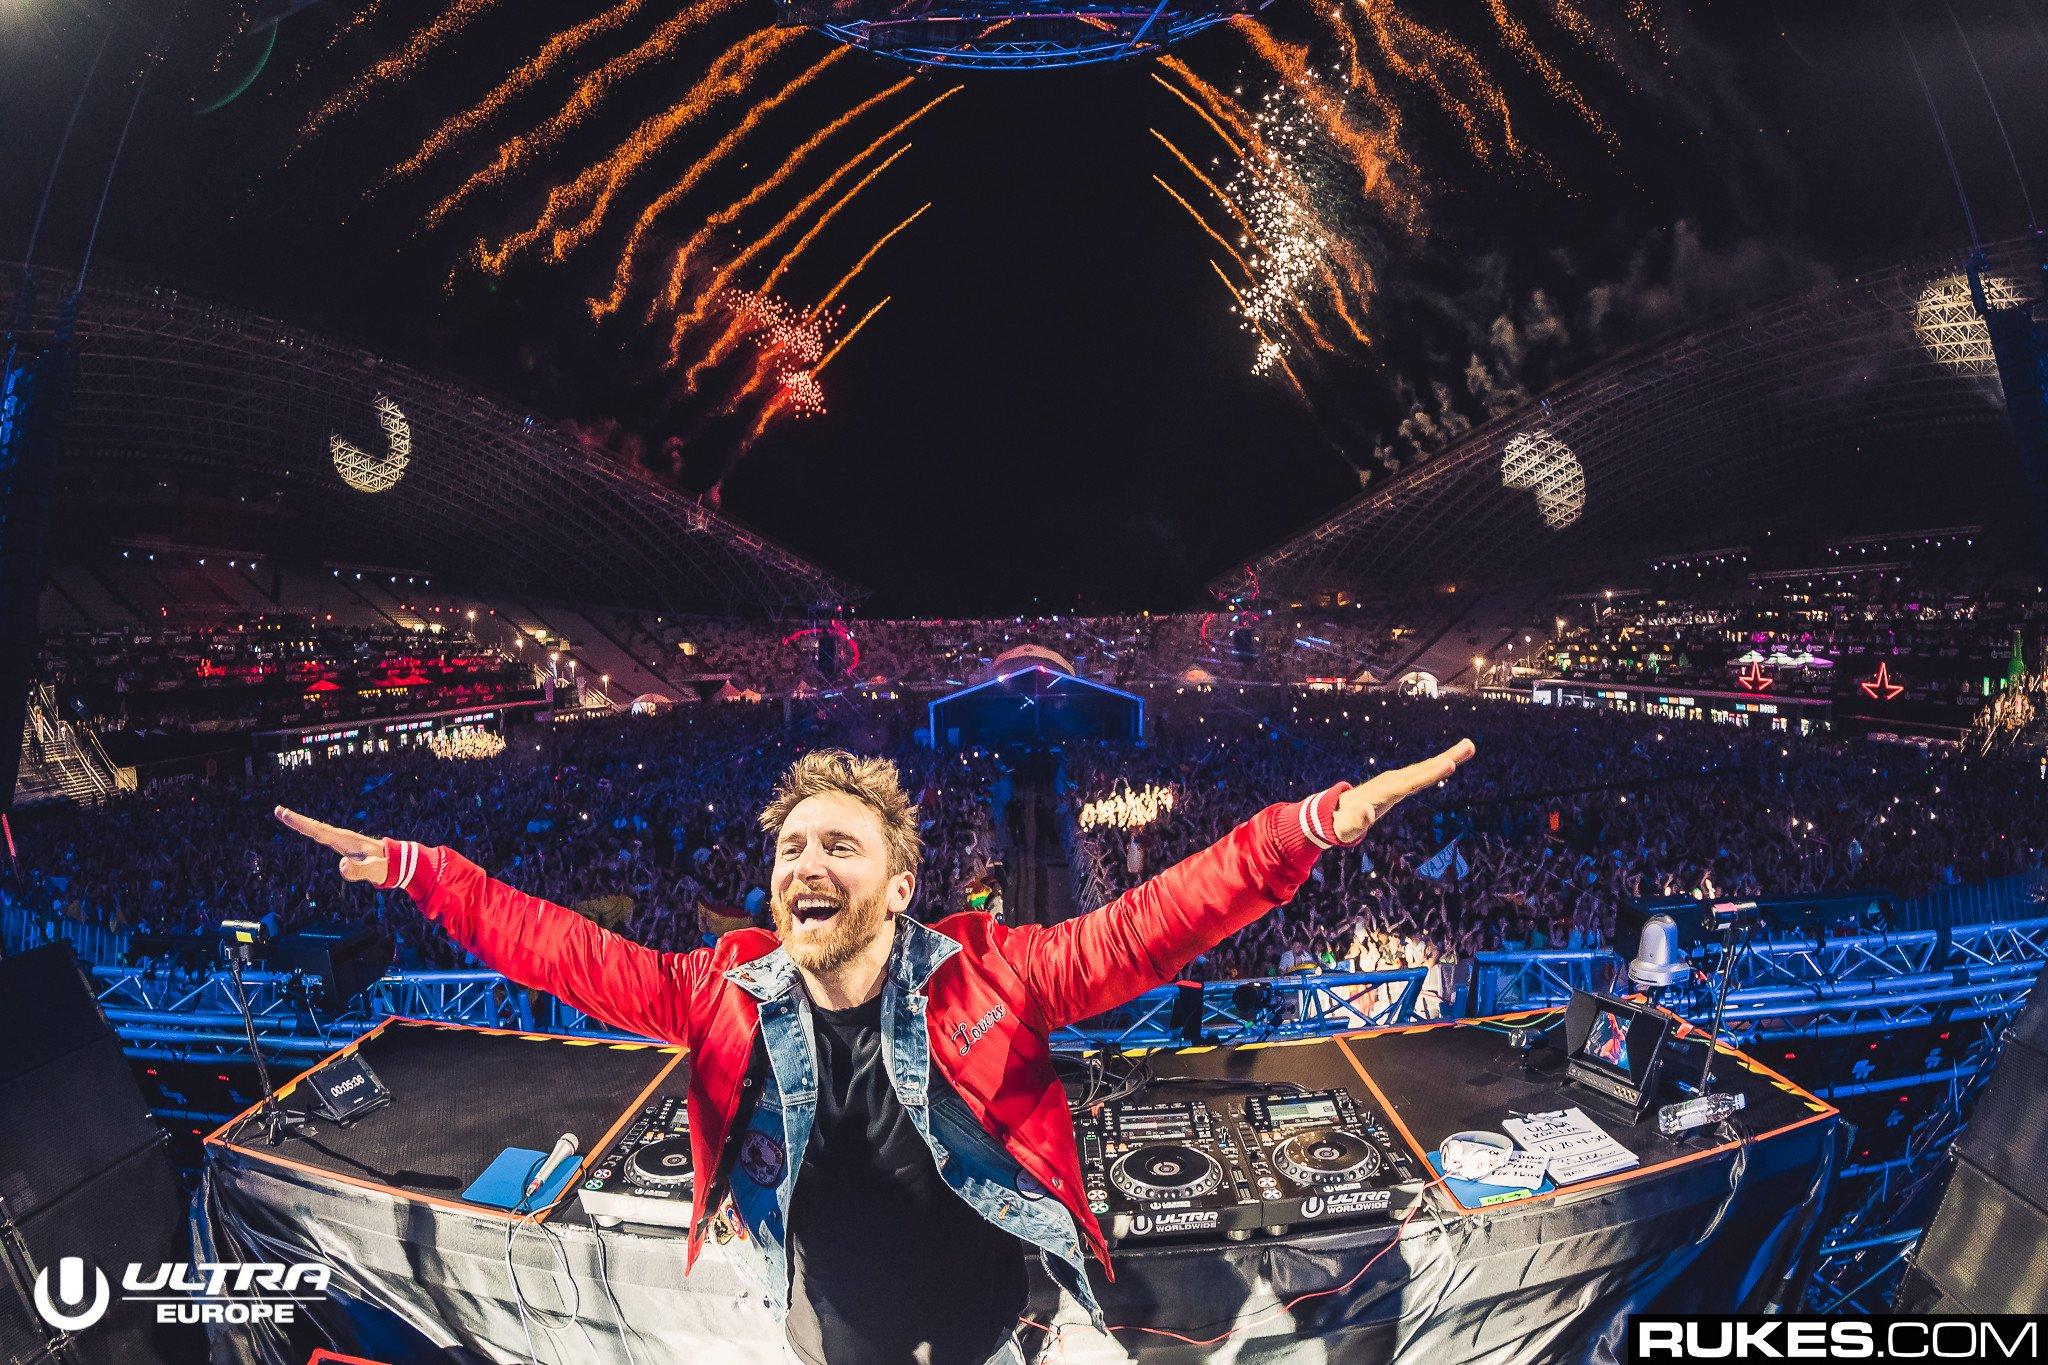 David Guettaが別名義「Jack Back」としてニューアルバム『7』の収録曲を使ったミックスを公開!